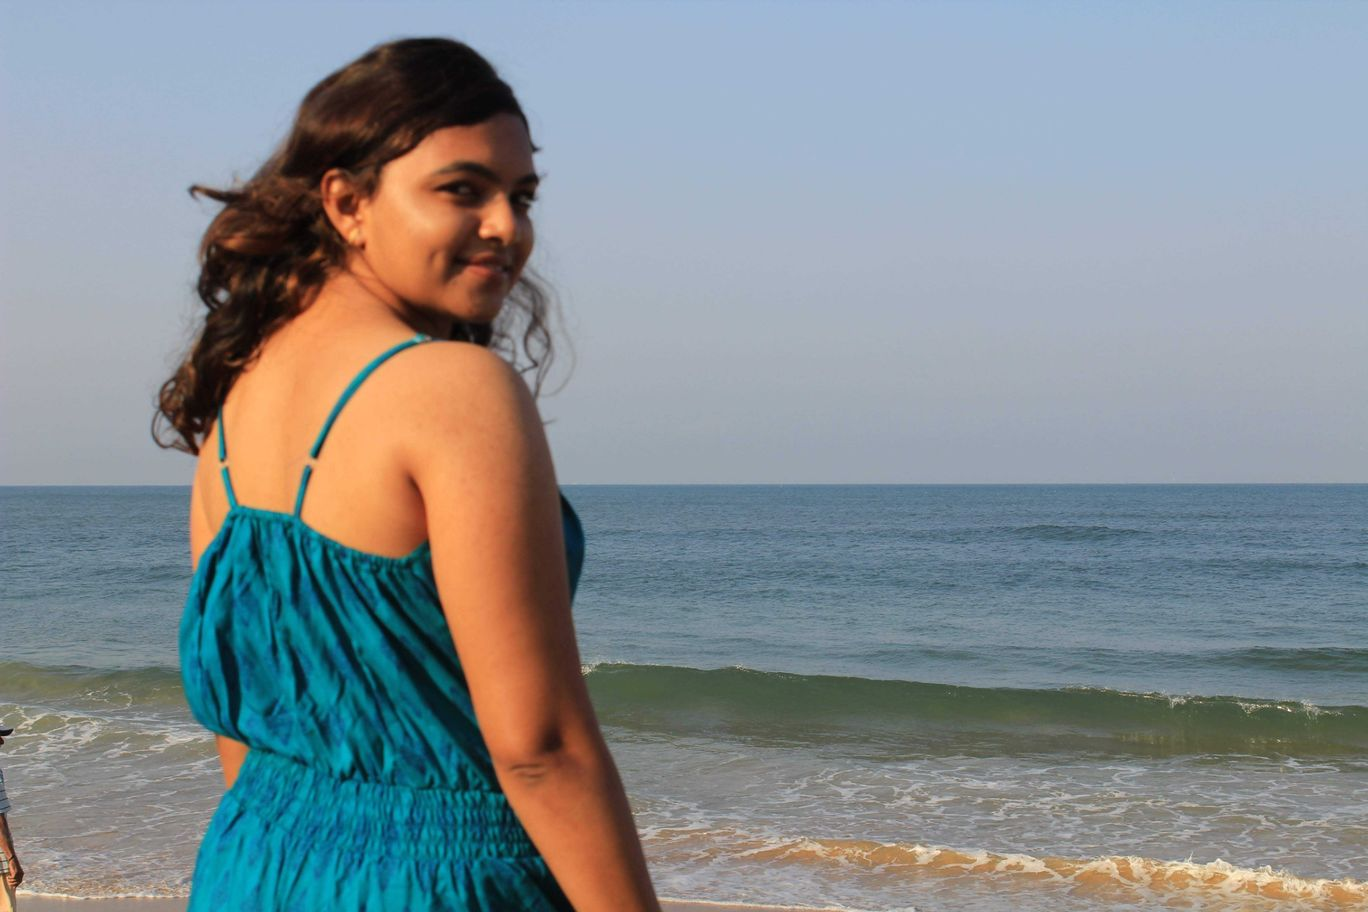 Photo of Candolim Beach By Aman Gupta